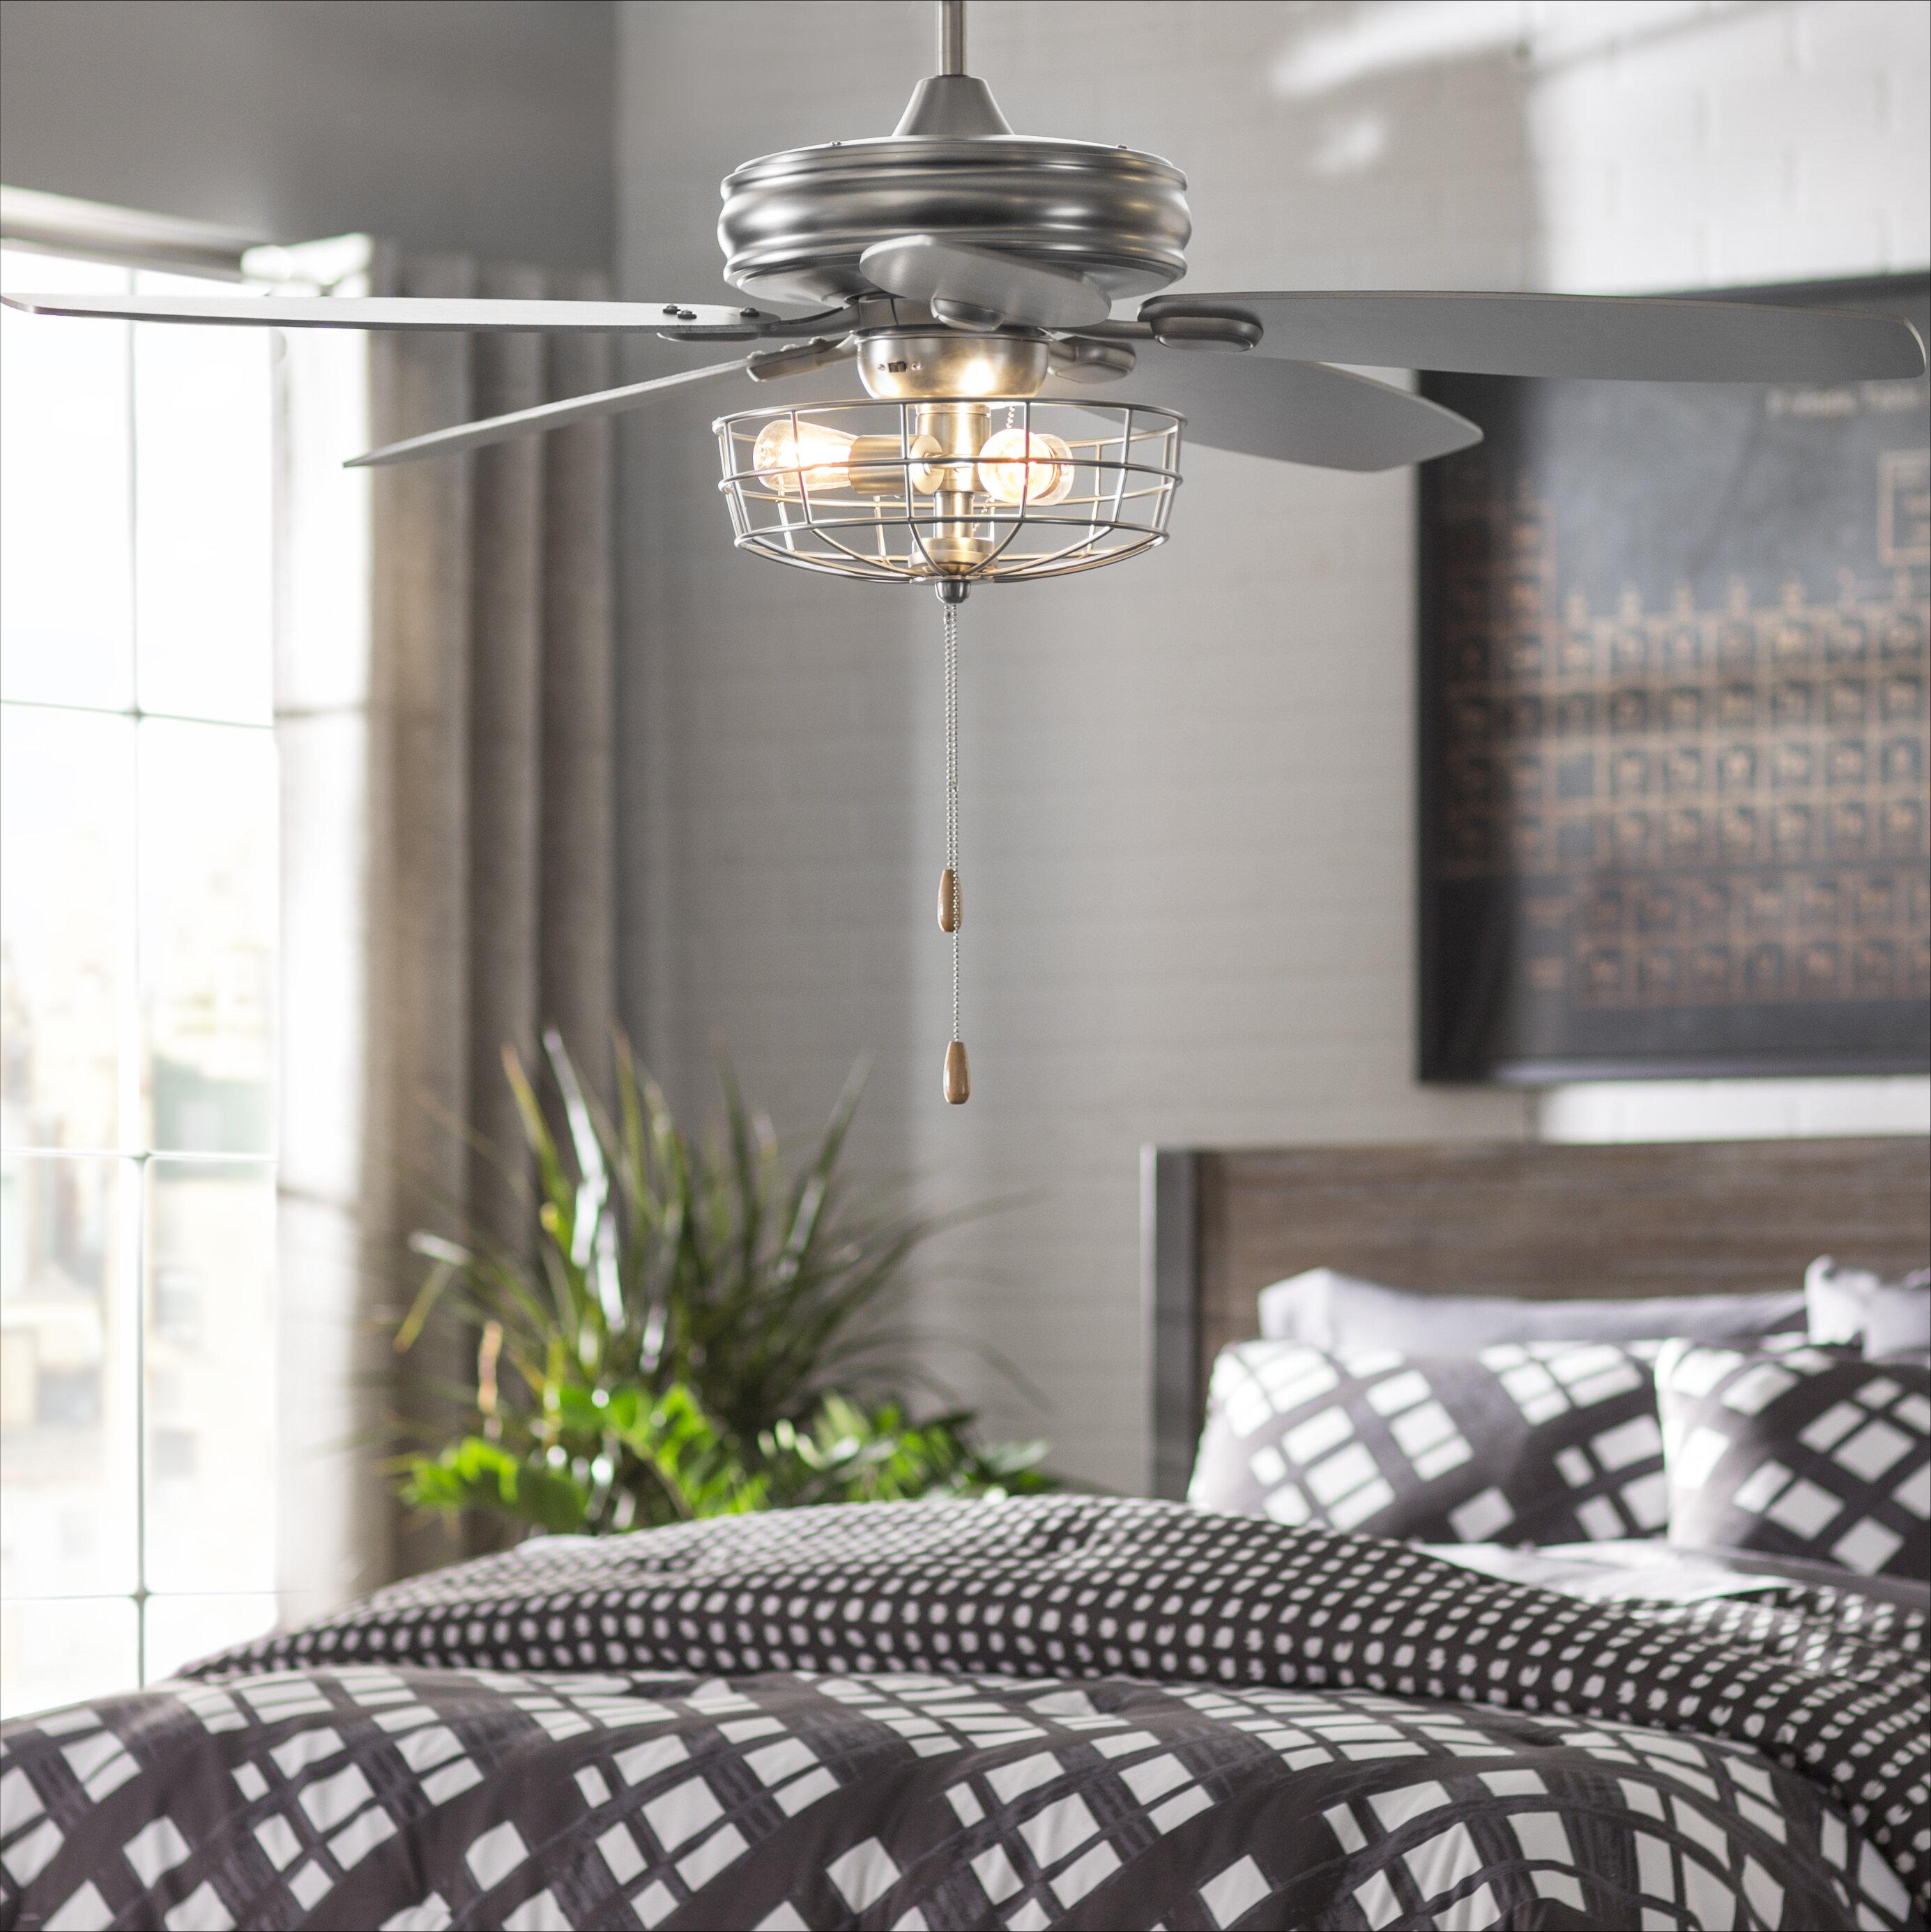 Amazon.com: Yellow - Ceiling Fans / Ceiling Fans & Accessories ...